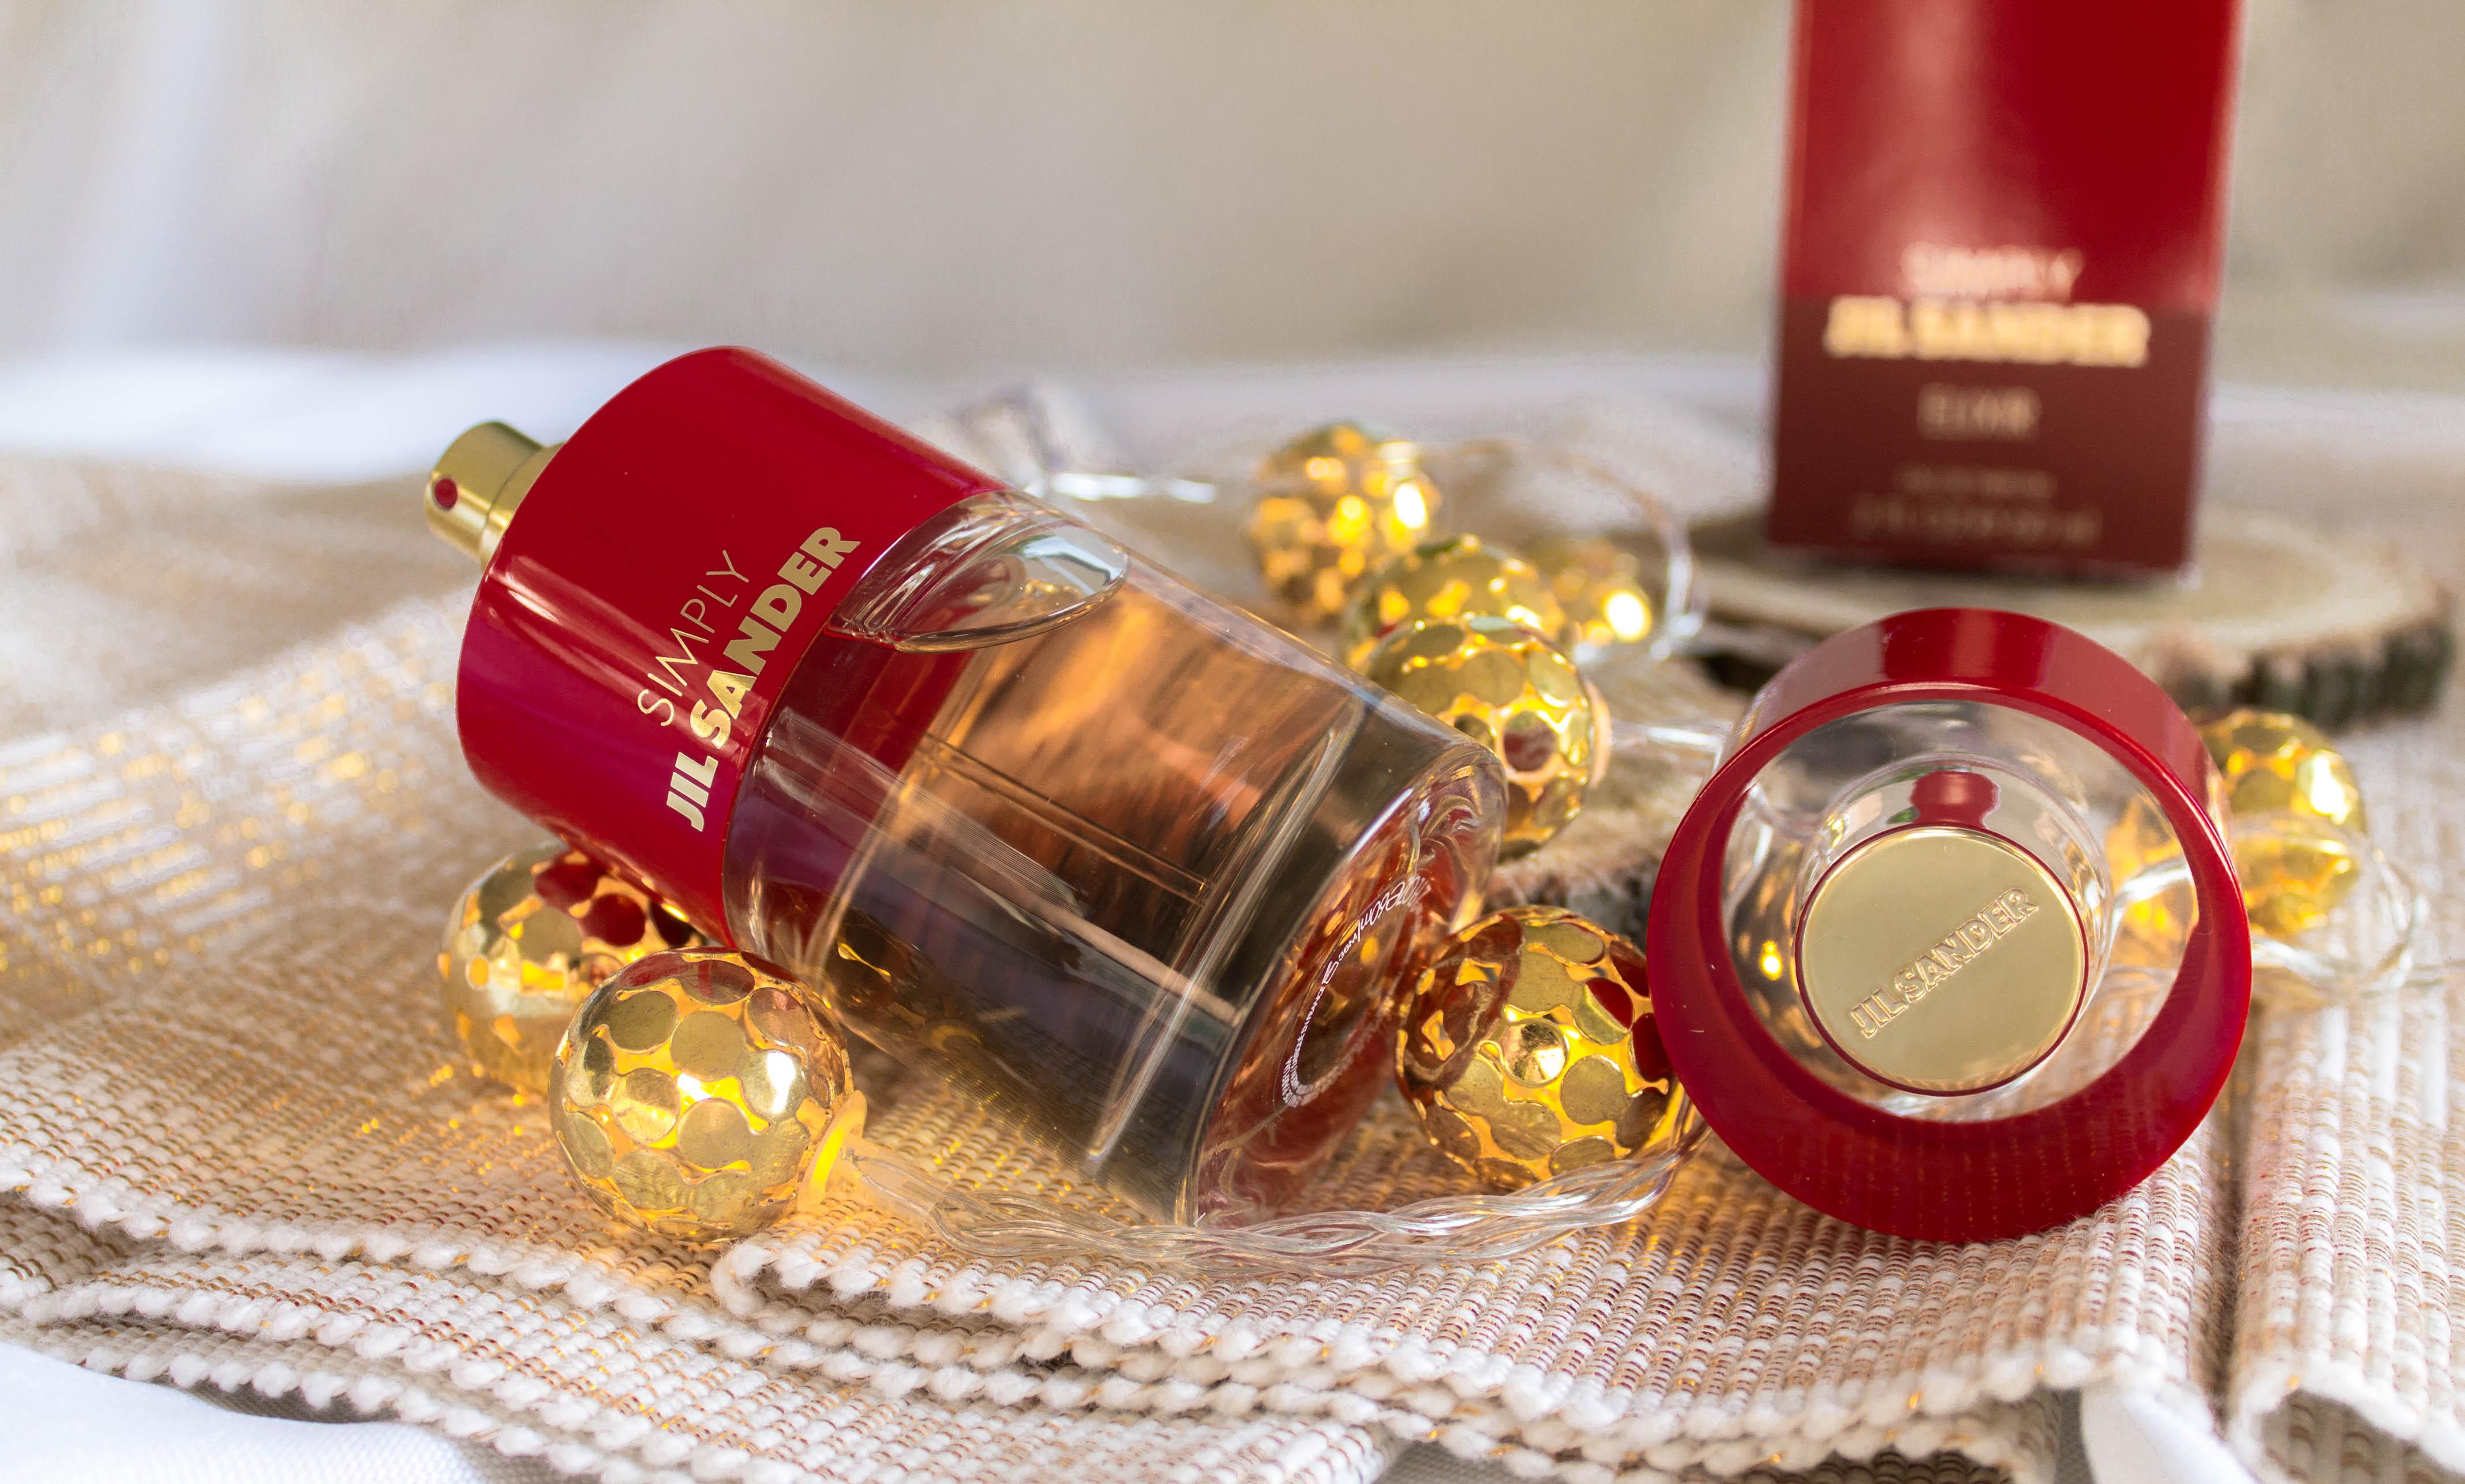 jil sander parfum simply gold red kardiaserena (2)